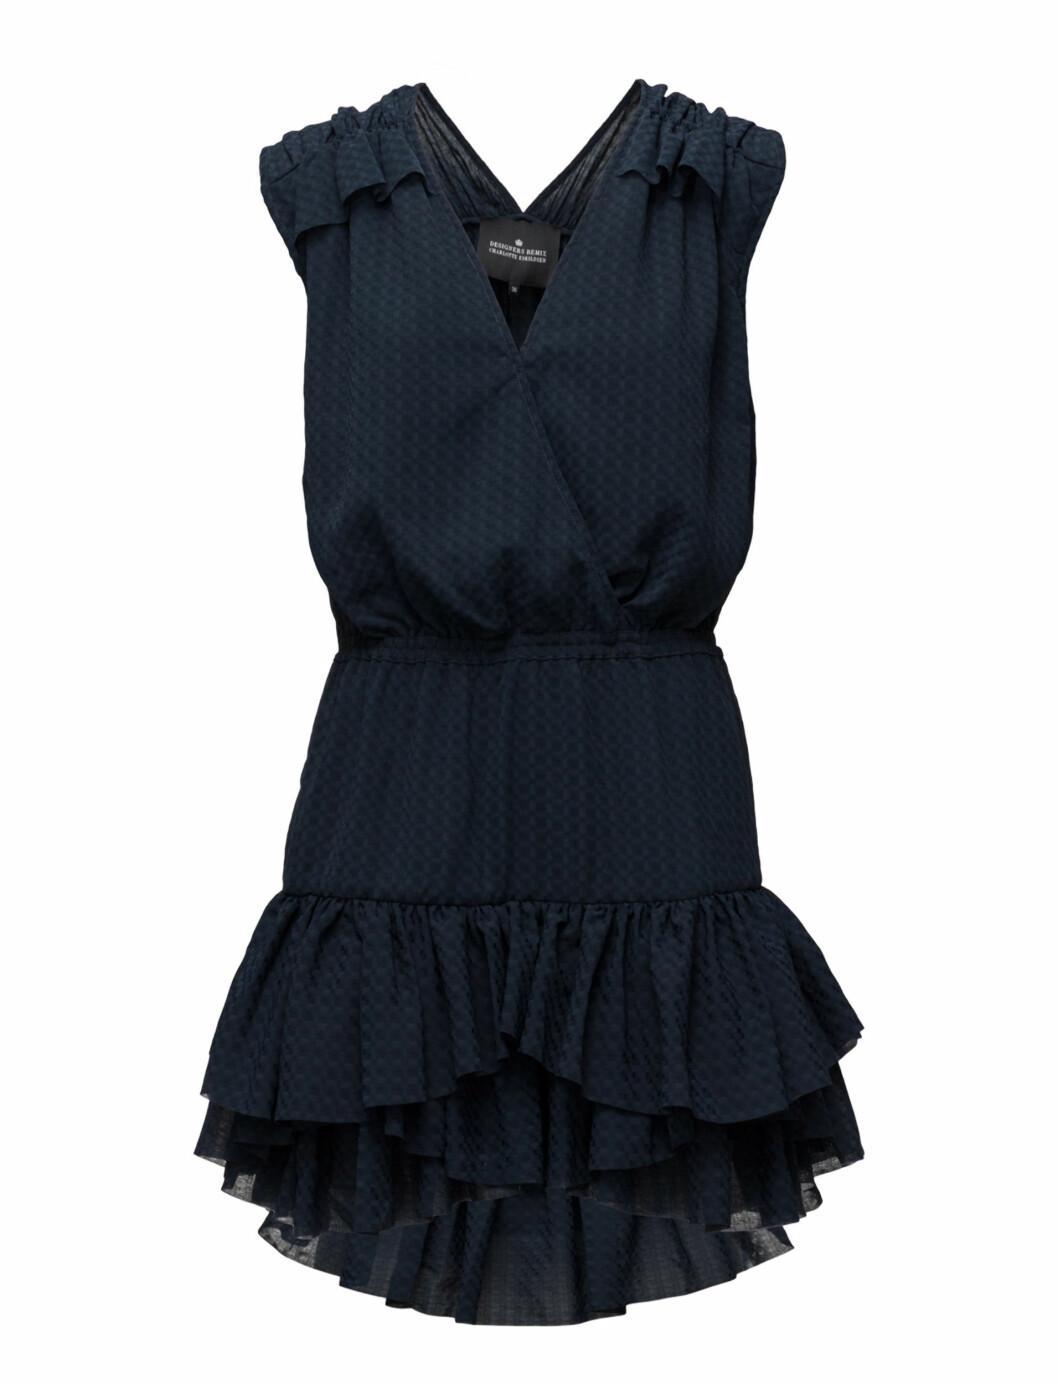 <strong>Blå kjole fra Designers Remix |kr 1900 | http:</strong>//apprl.com/sv/pd/4L6V/